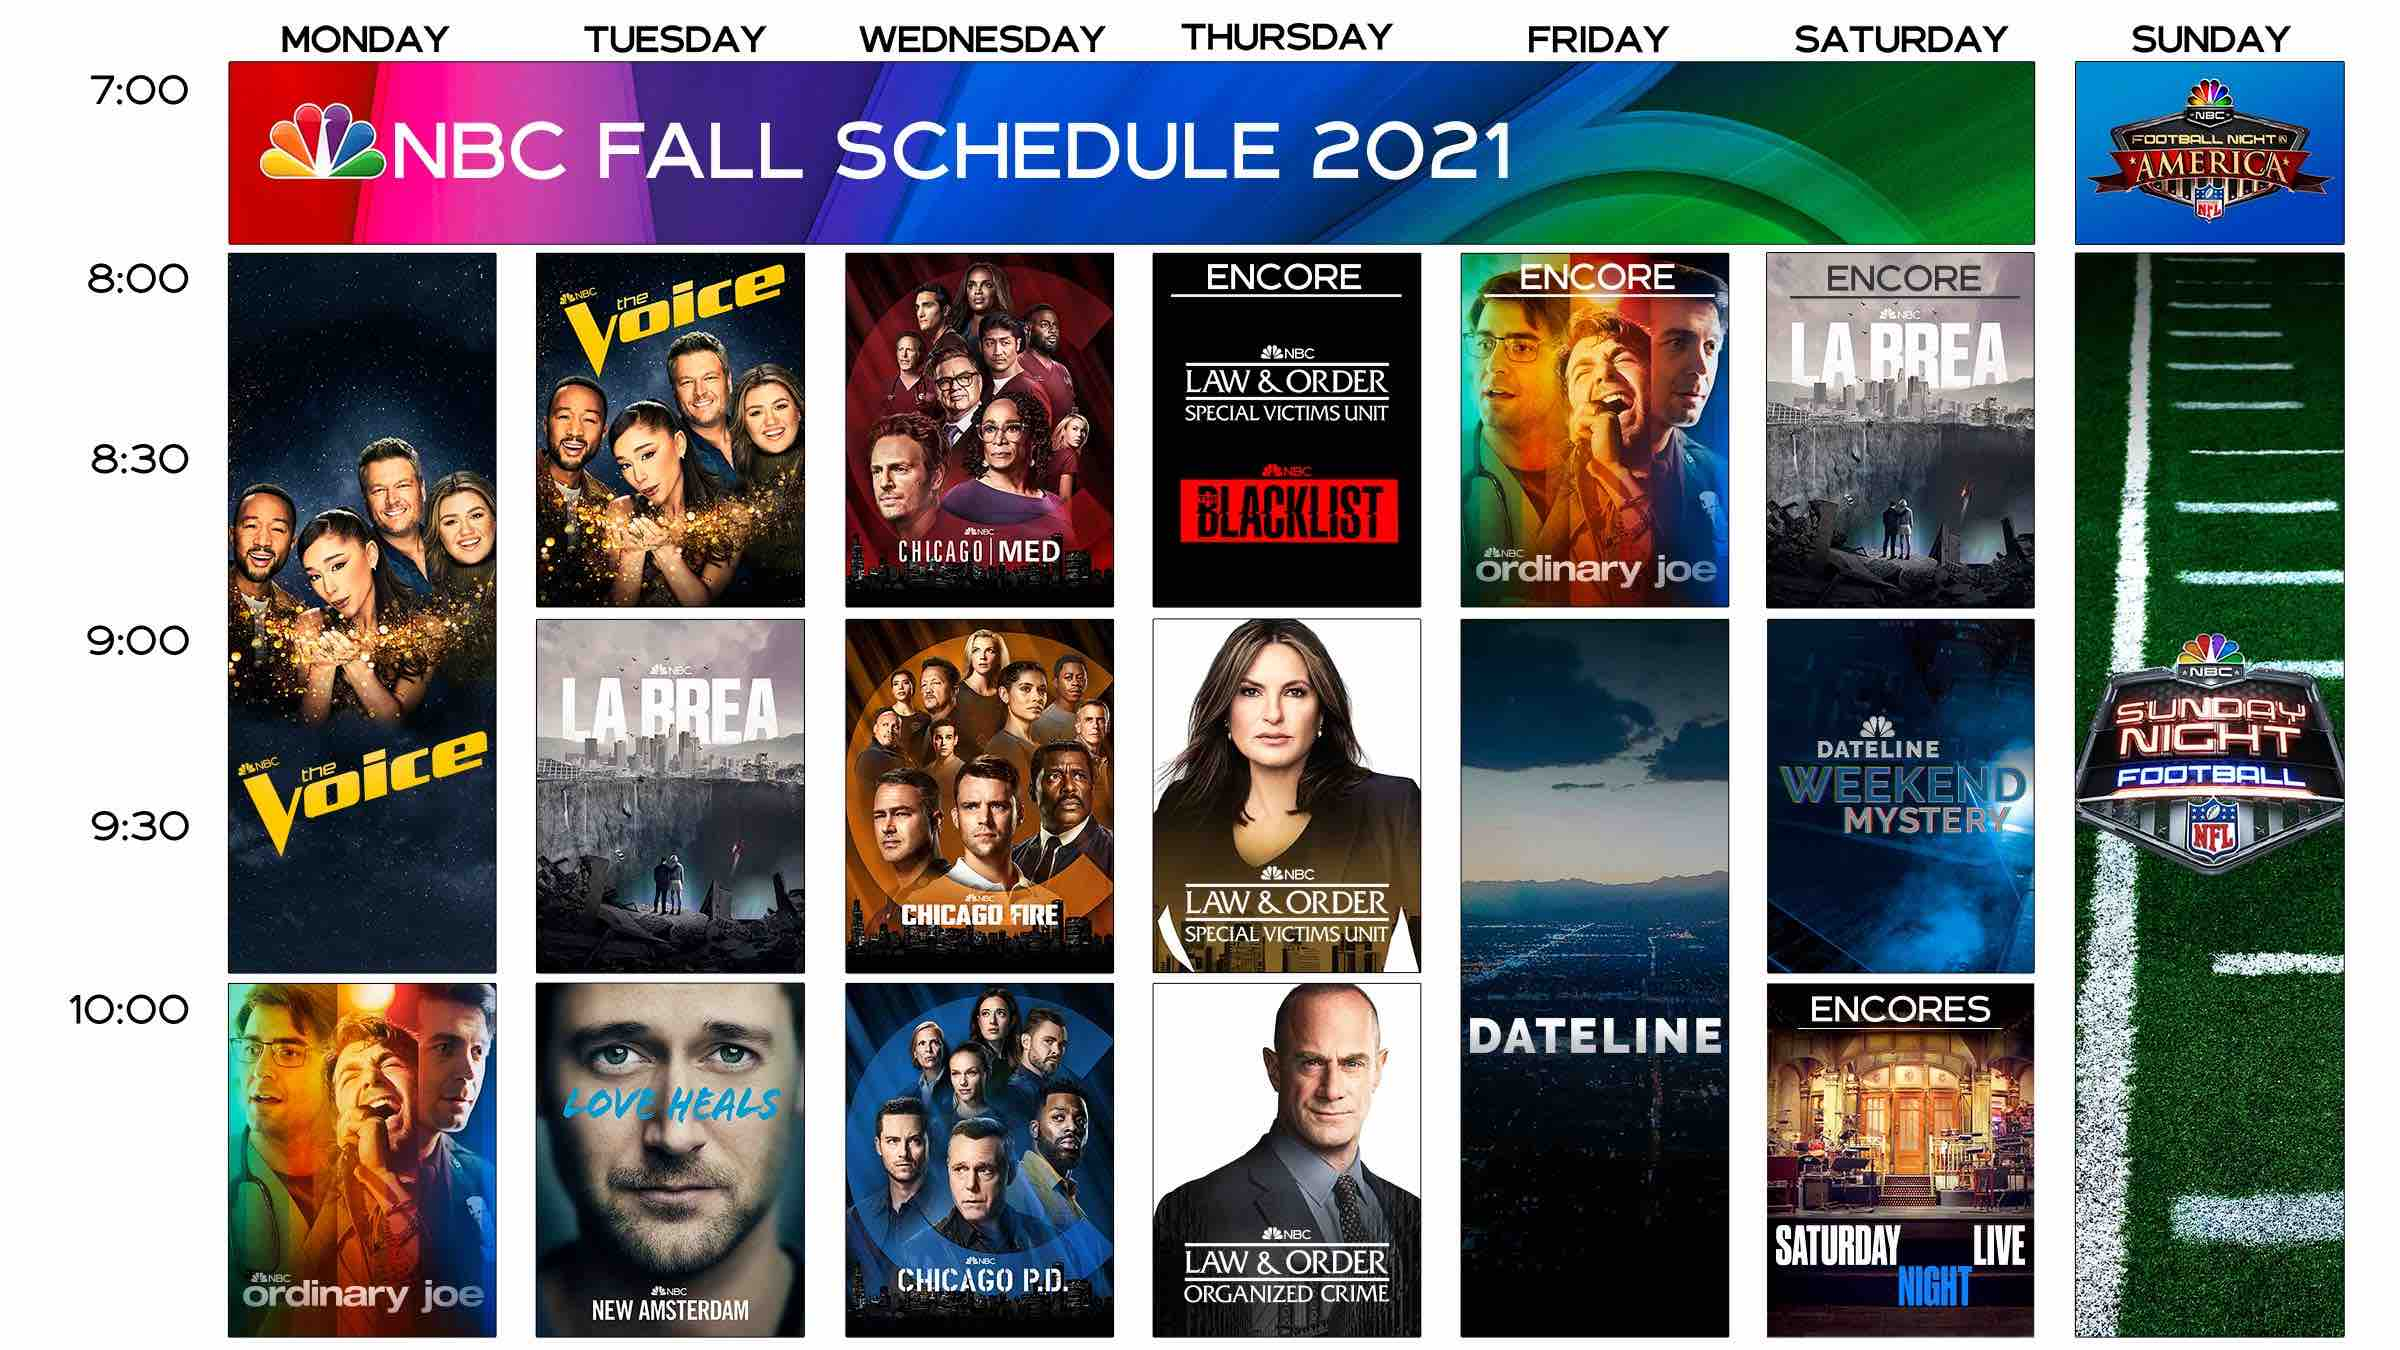 NBC Fall Lineup Schedule